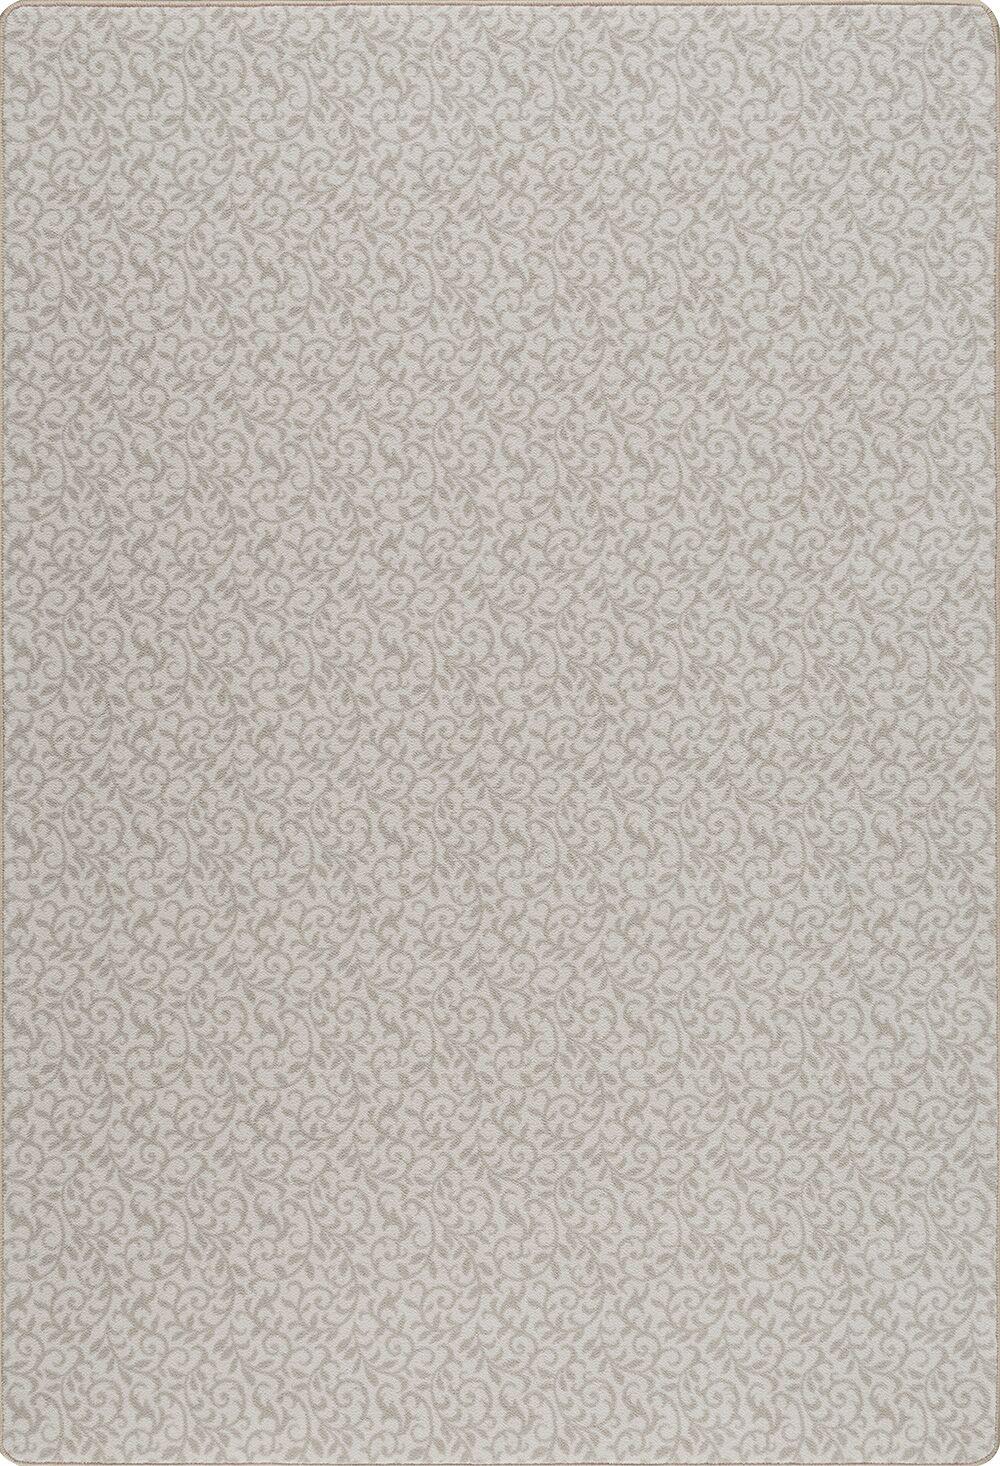 Hawkinge Birch Gray Area Rug Rug Size: Rectangle 3'10